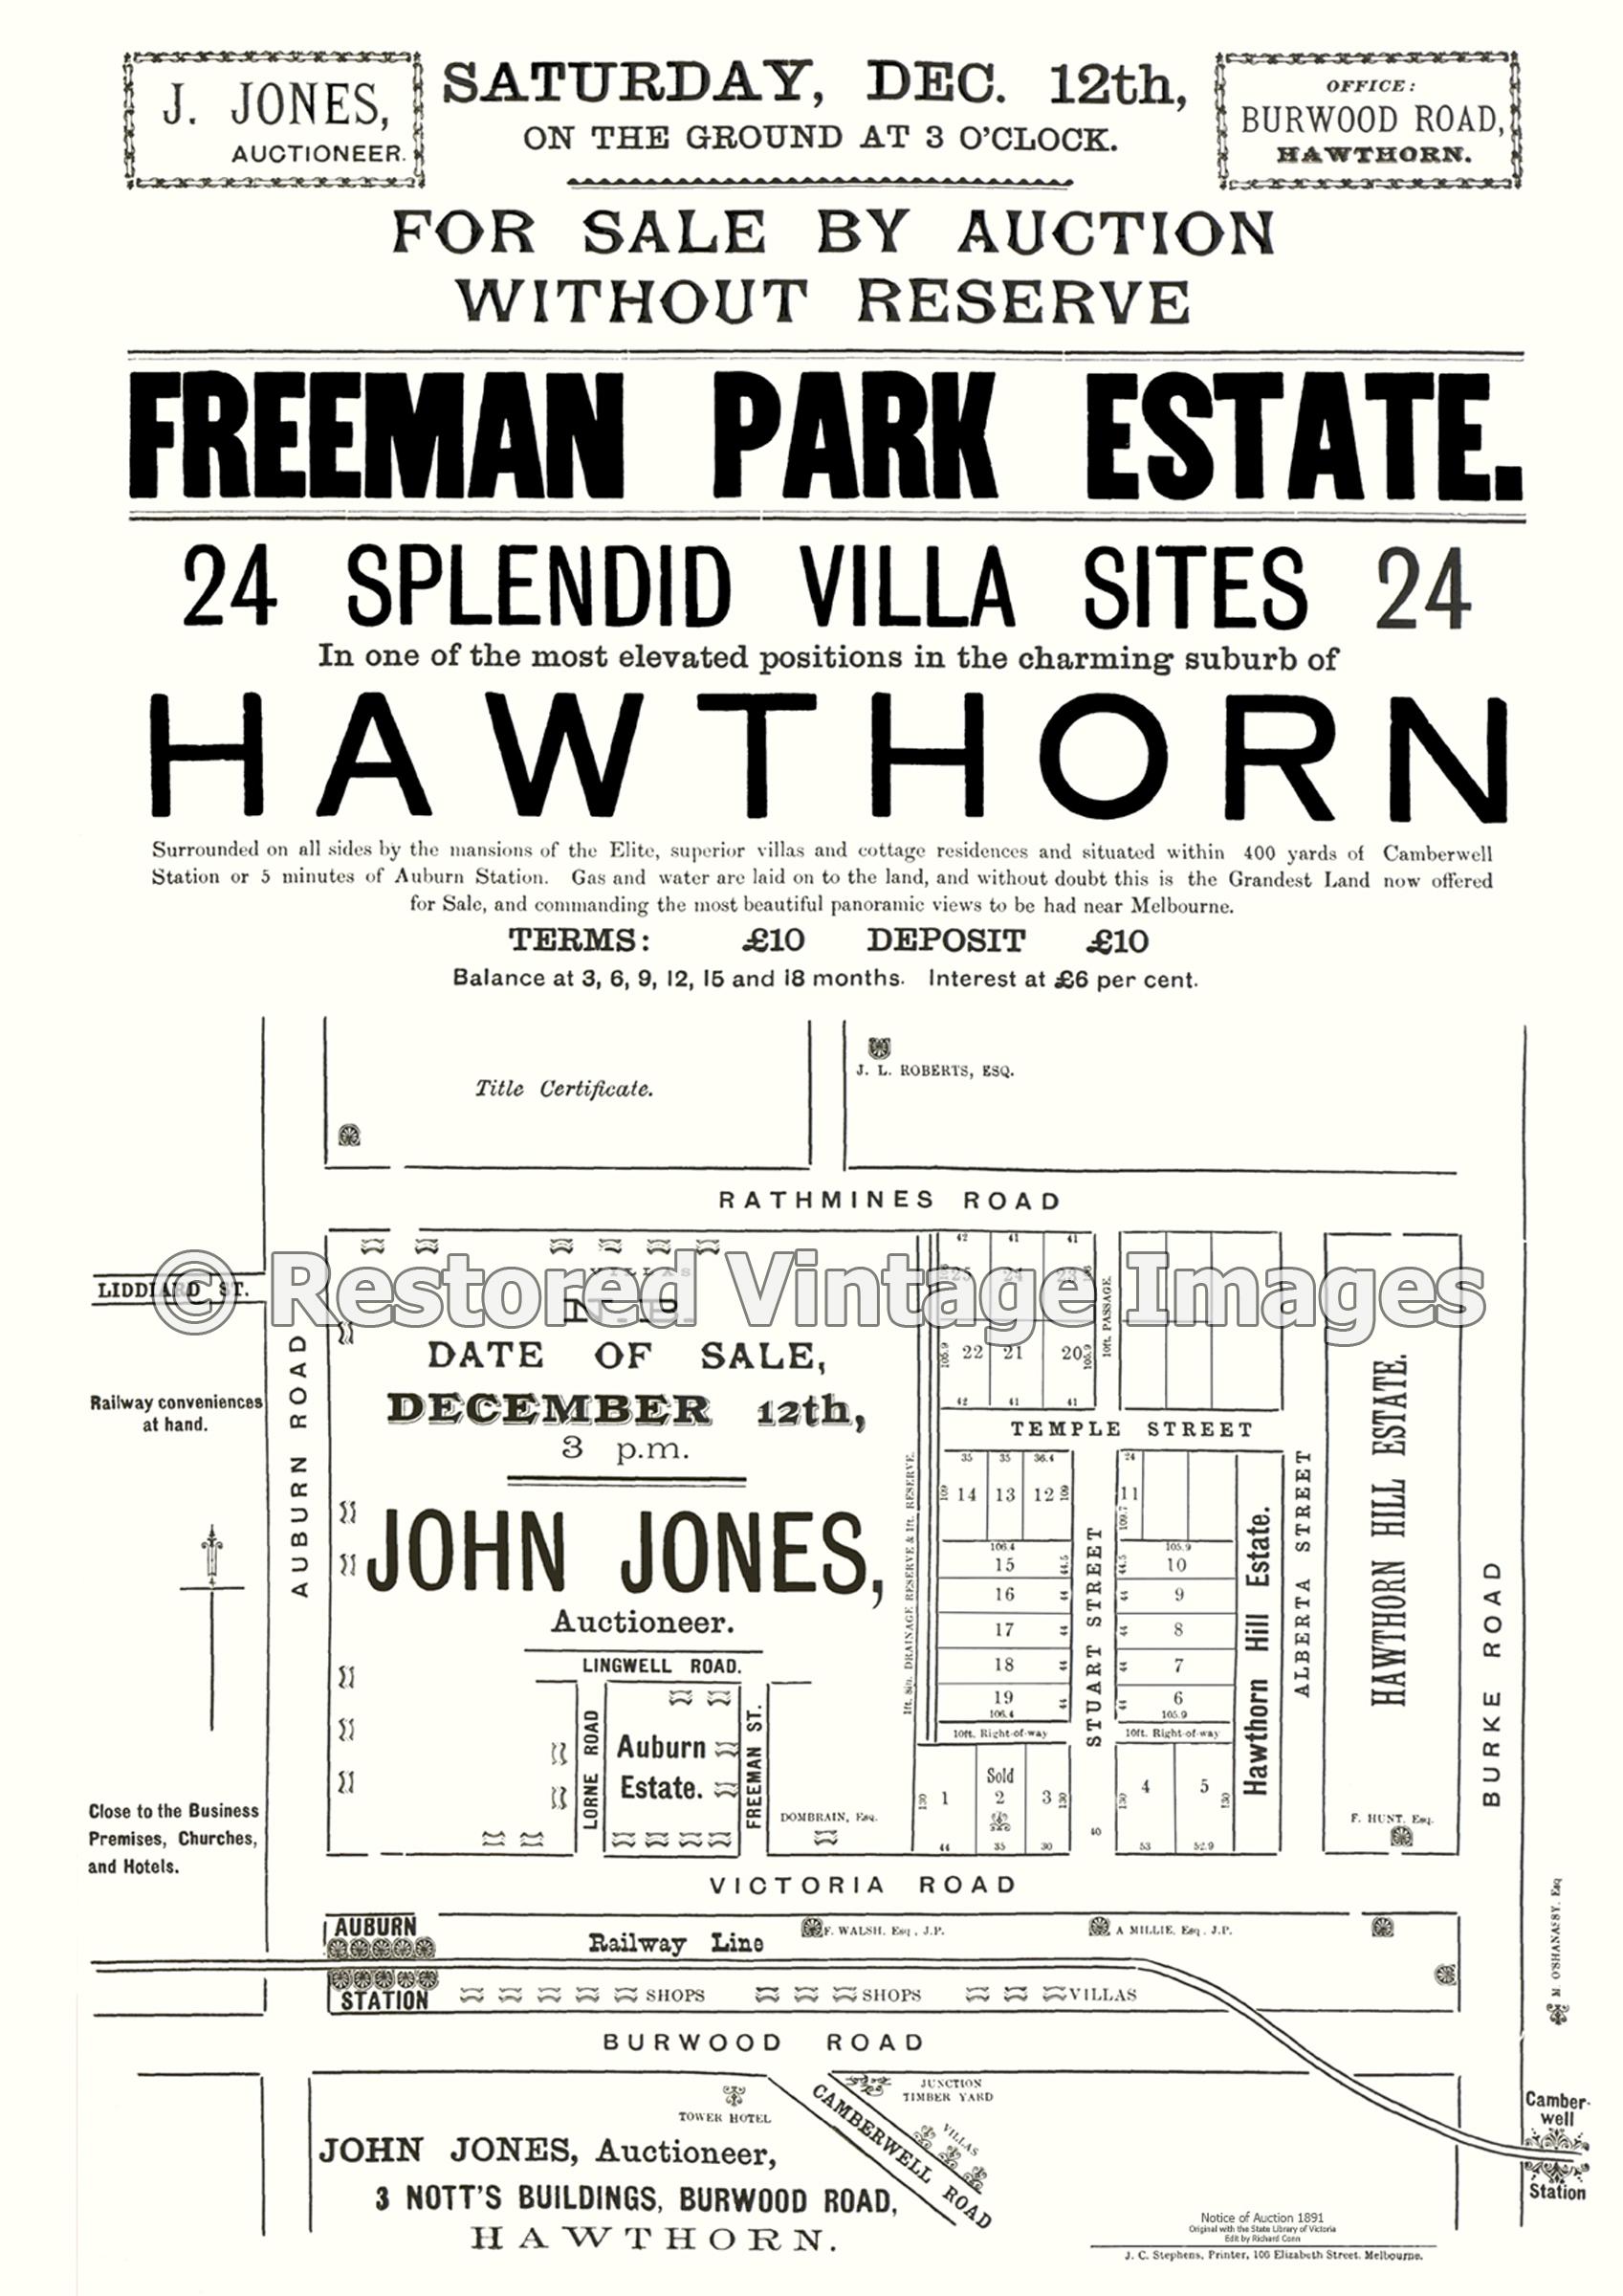 Freeman Park Estate Hawthorn 1891 – Hawthorn East